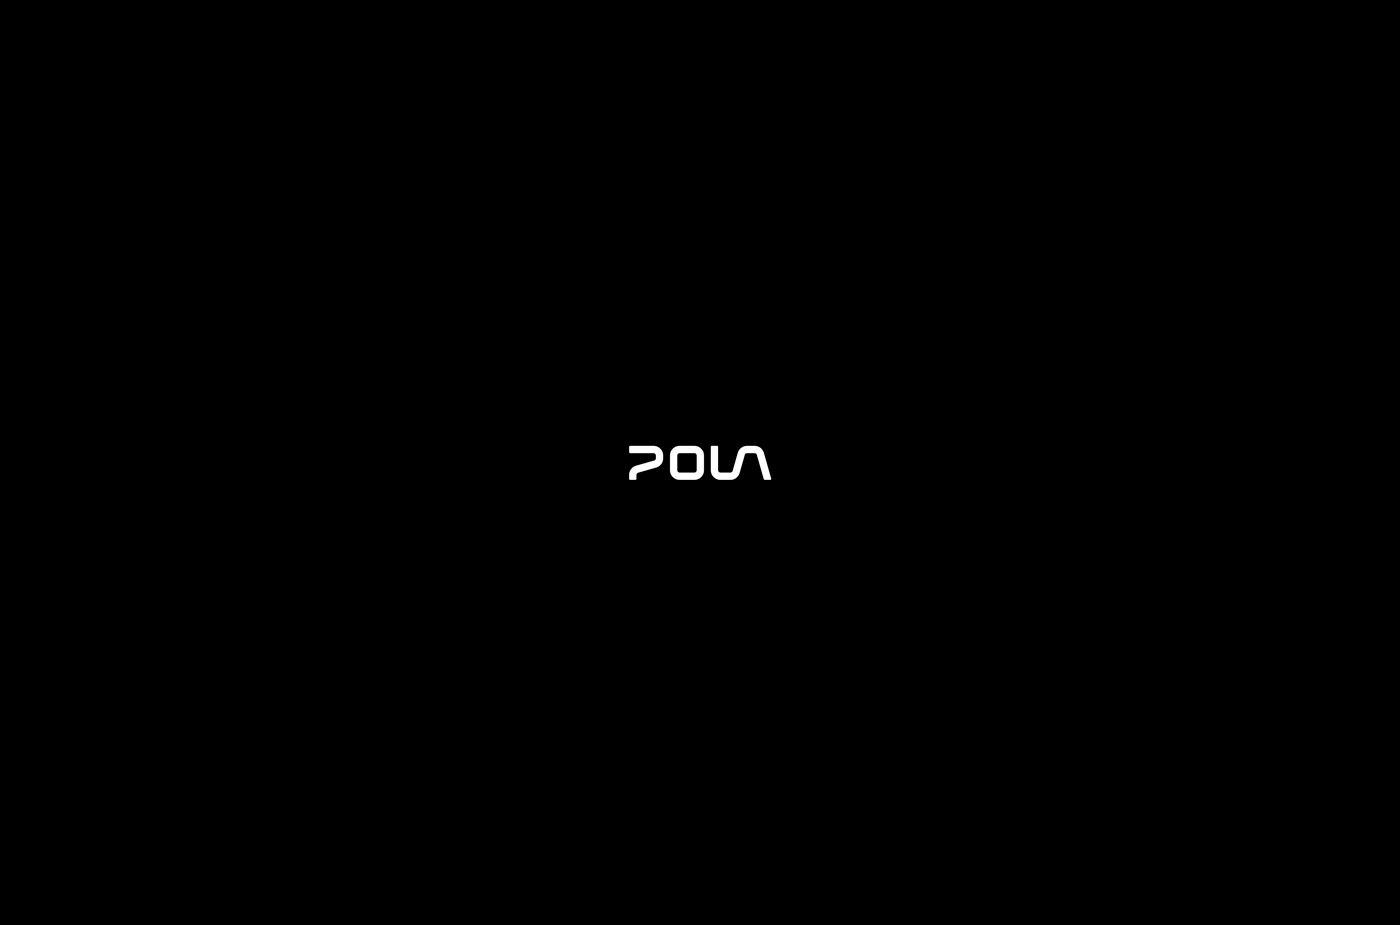 Pola.png